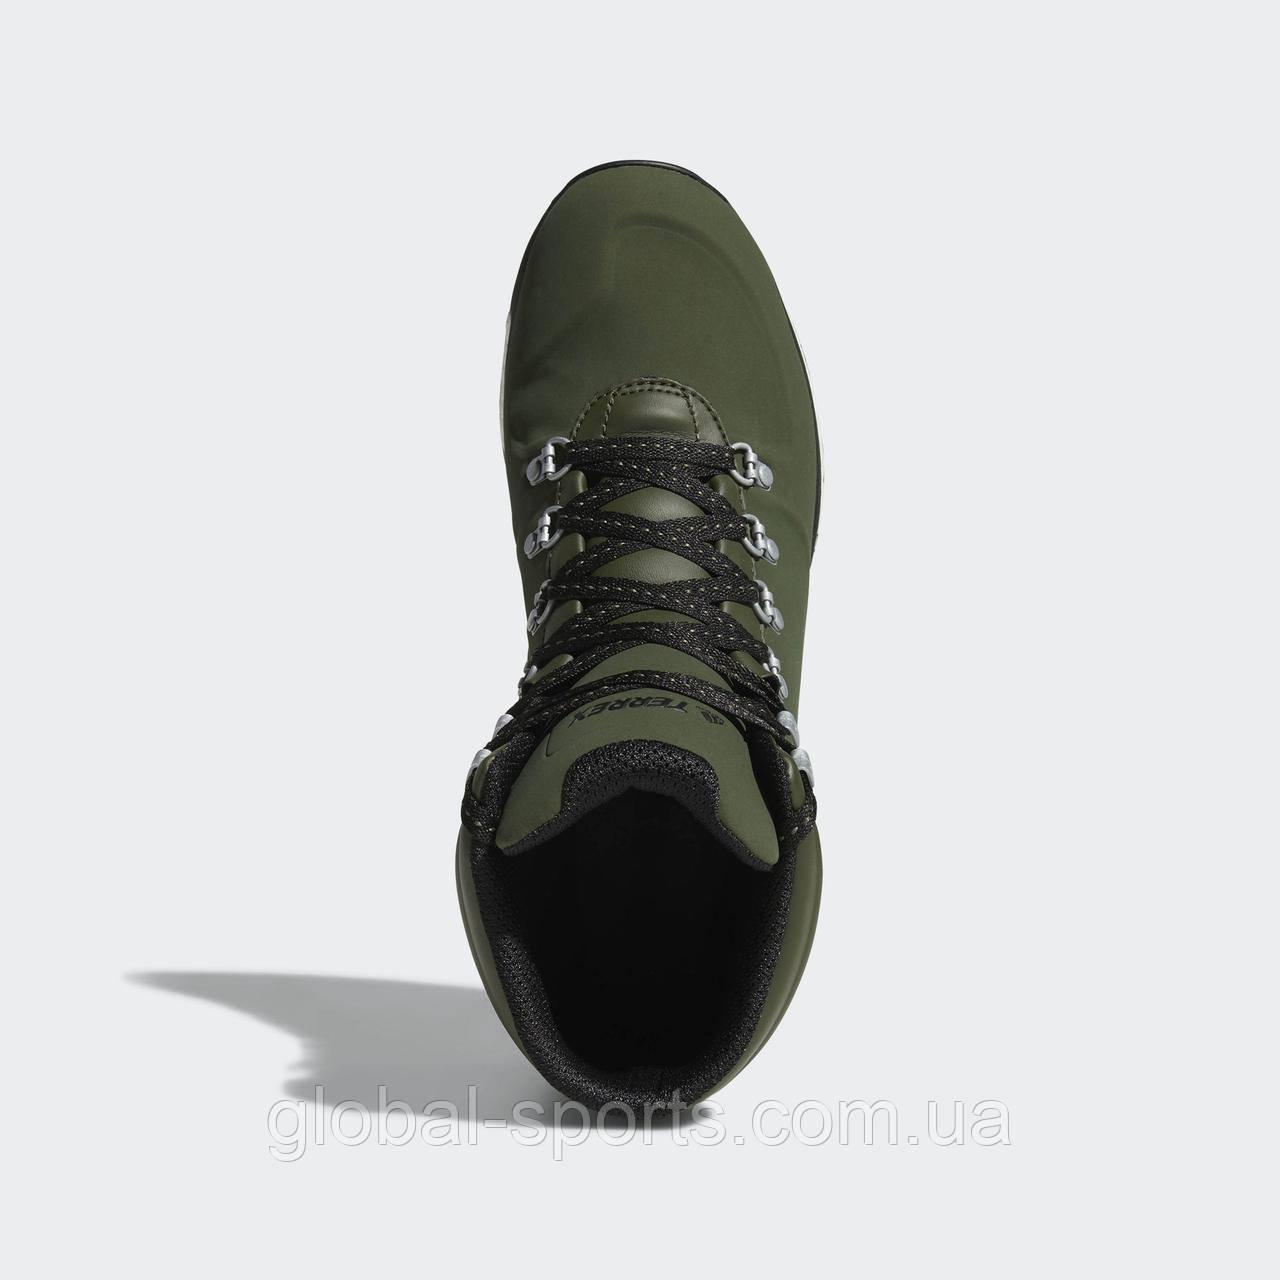 ... Мужские зимние ботинки Adidas Terrex Pathmaker CW(Артикул AC7930), ... 07f6296f638